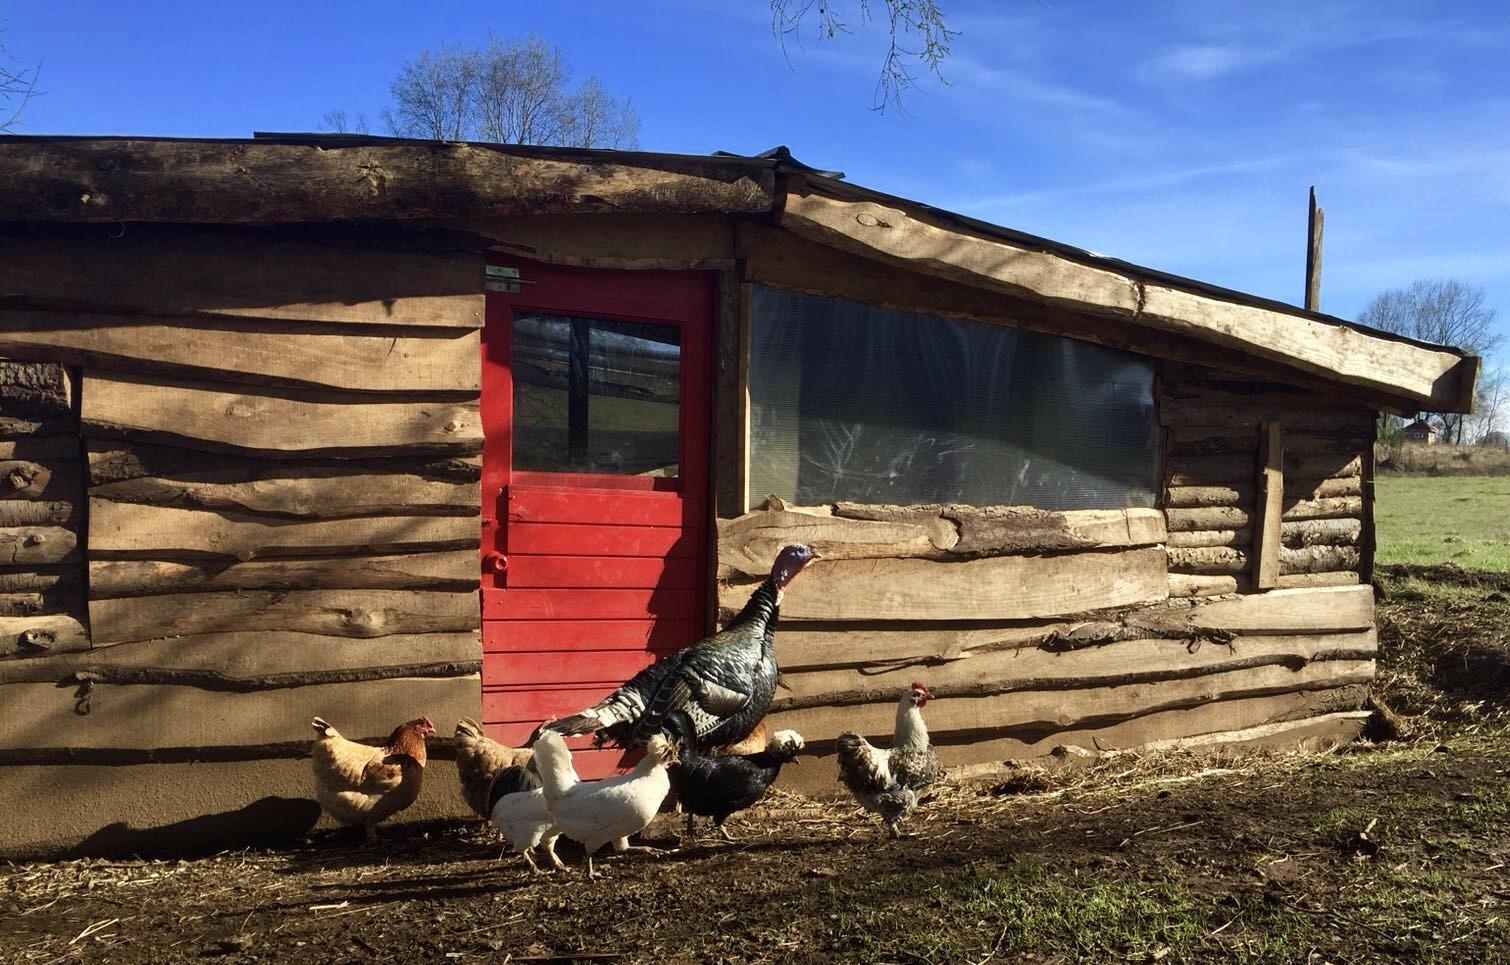 Organic Free Range Chicken coop on Samadhi Eco Resort Chile